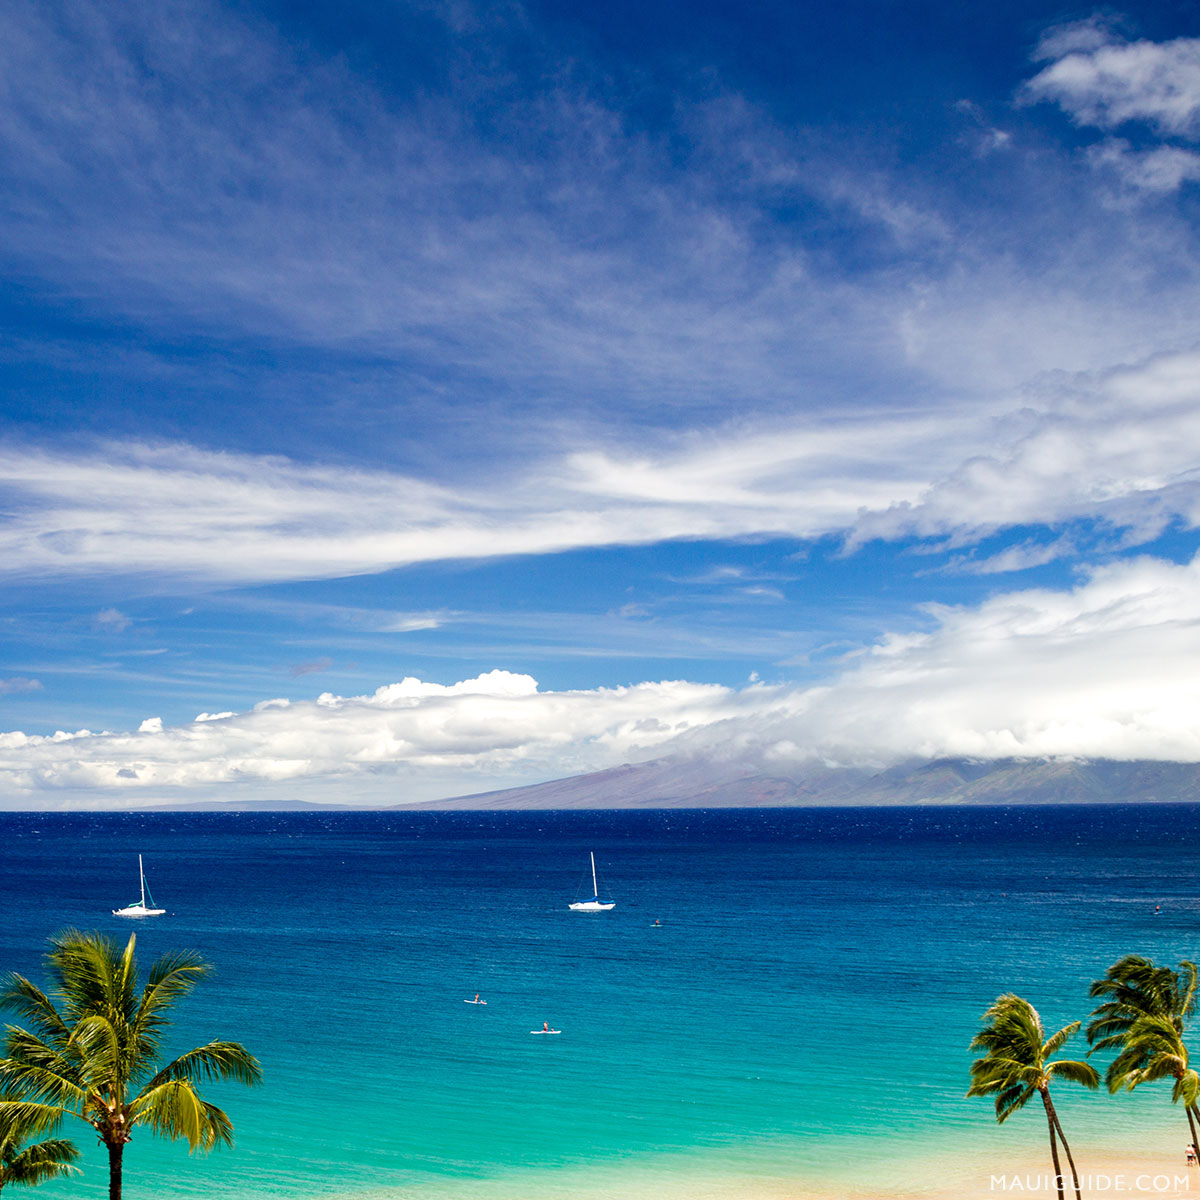 Hope you're enjoying your Saturday! #maui #hawaii #beaches #ocean<br>http://pic.twitter.com/ZaSAFlZzKj